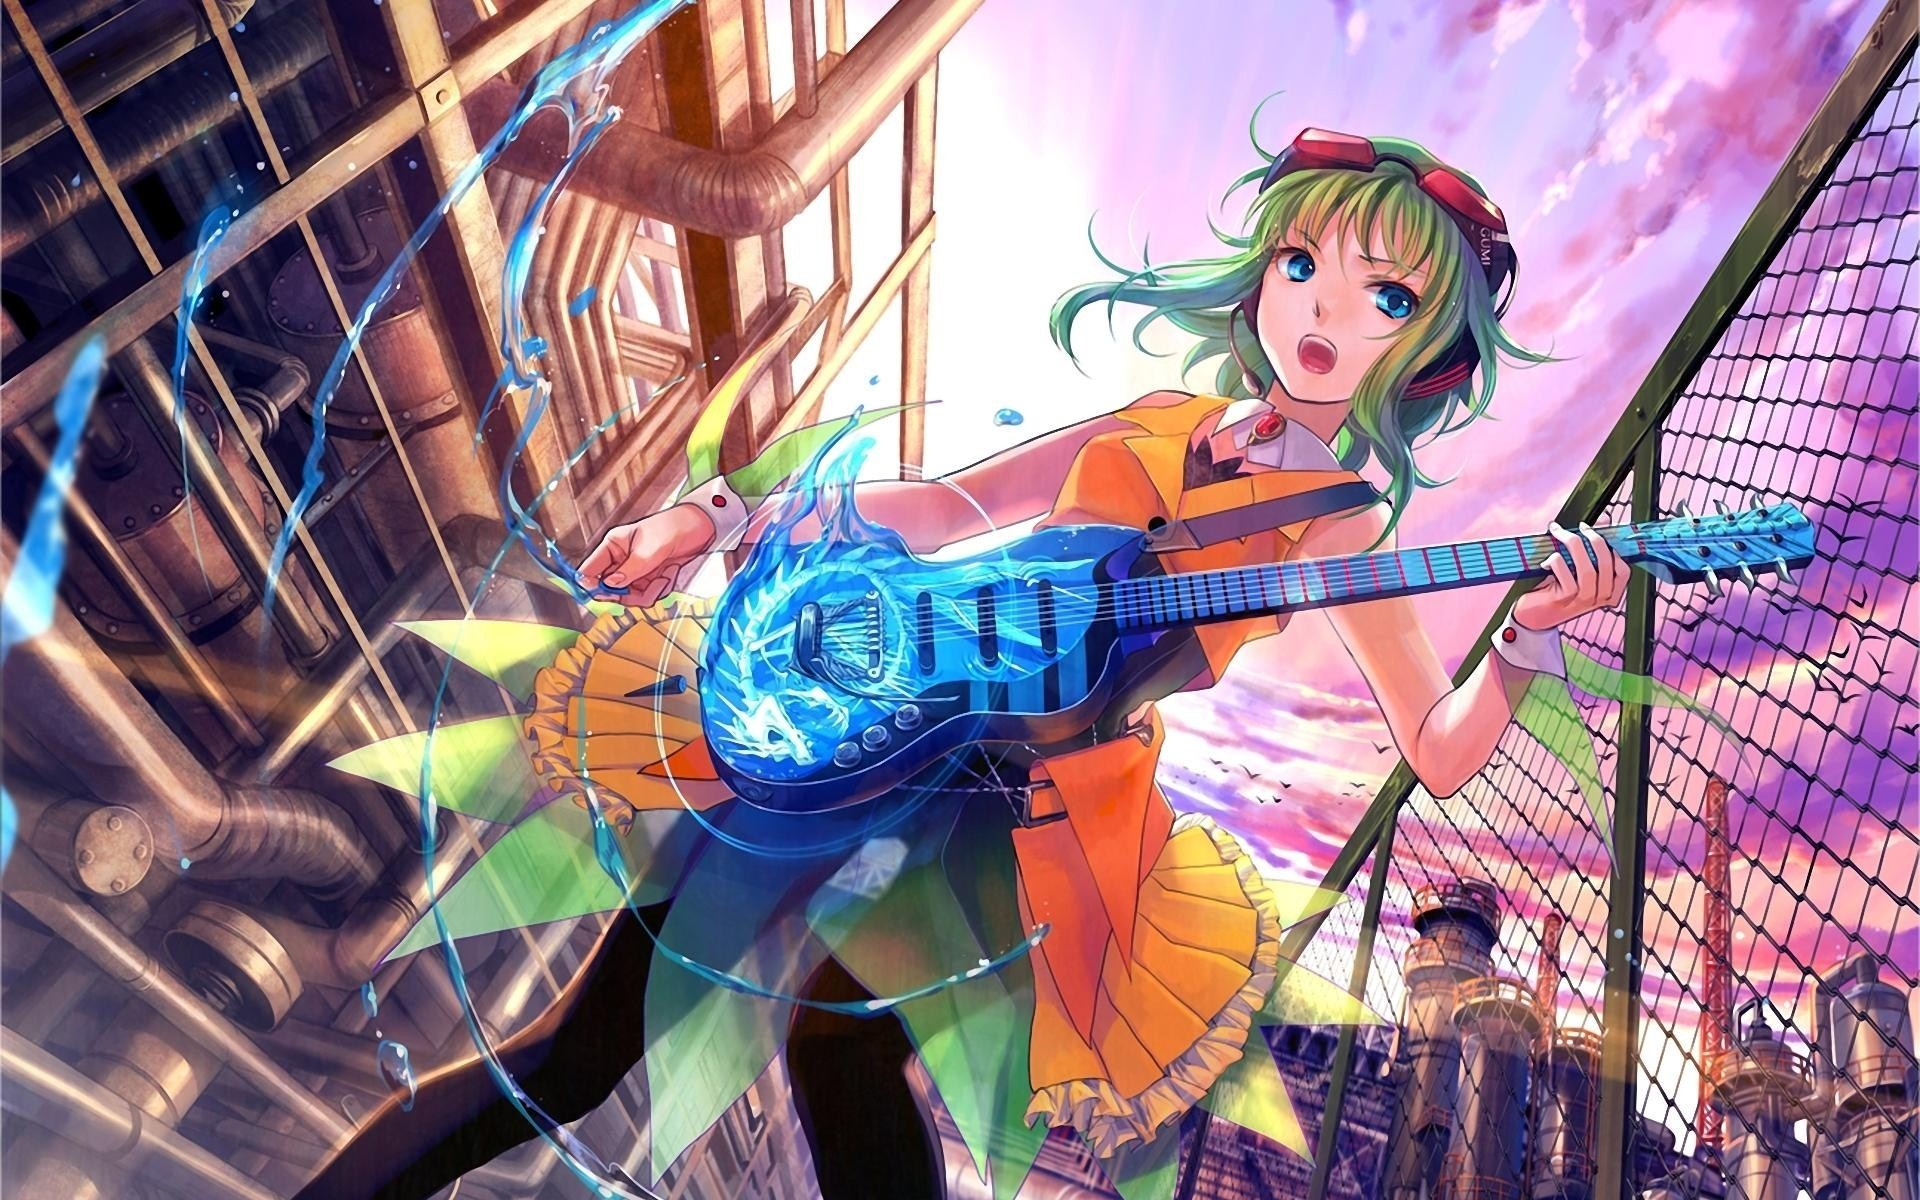 Anime Girl Guitar Music Art HD Wallpaper – FreeHDWalls